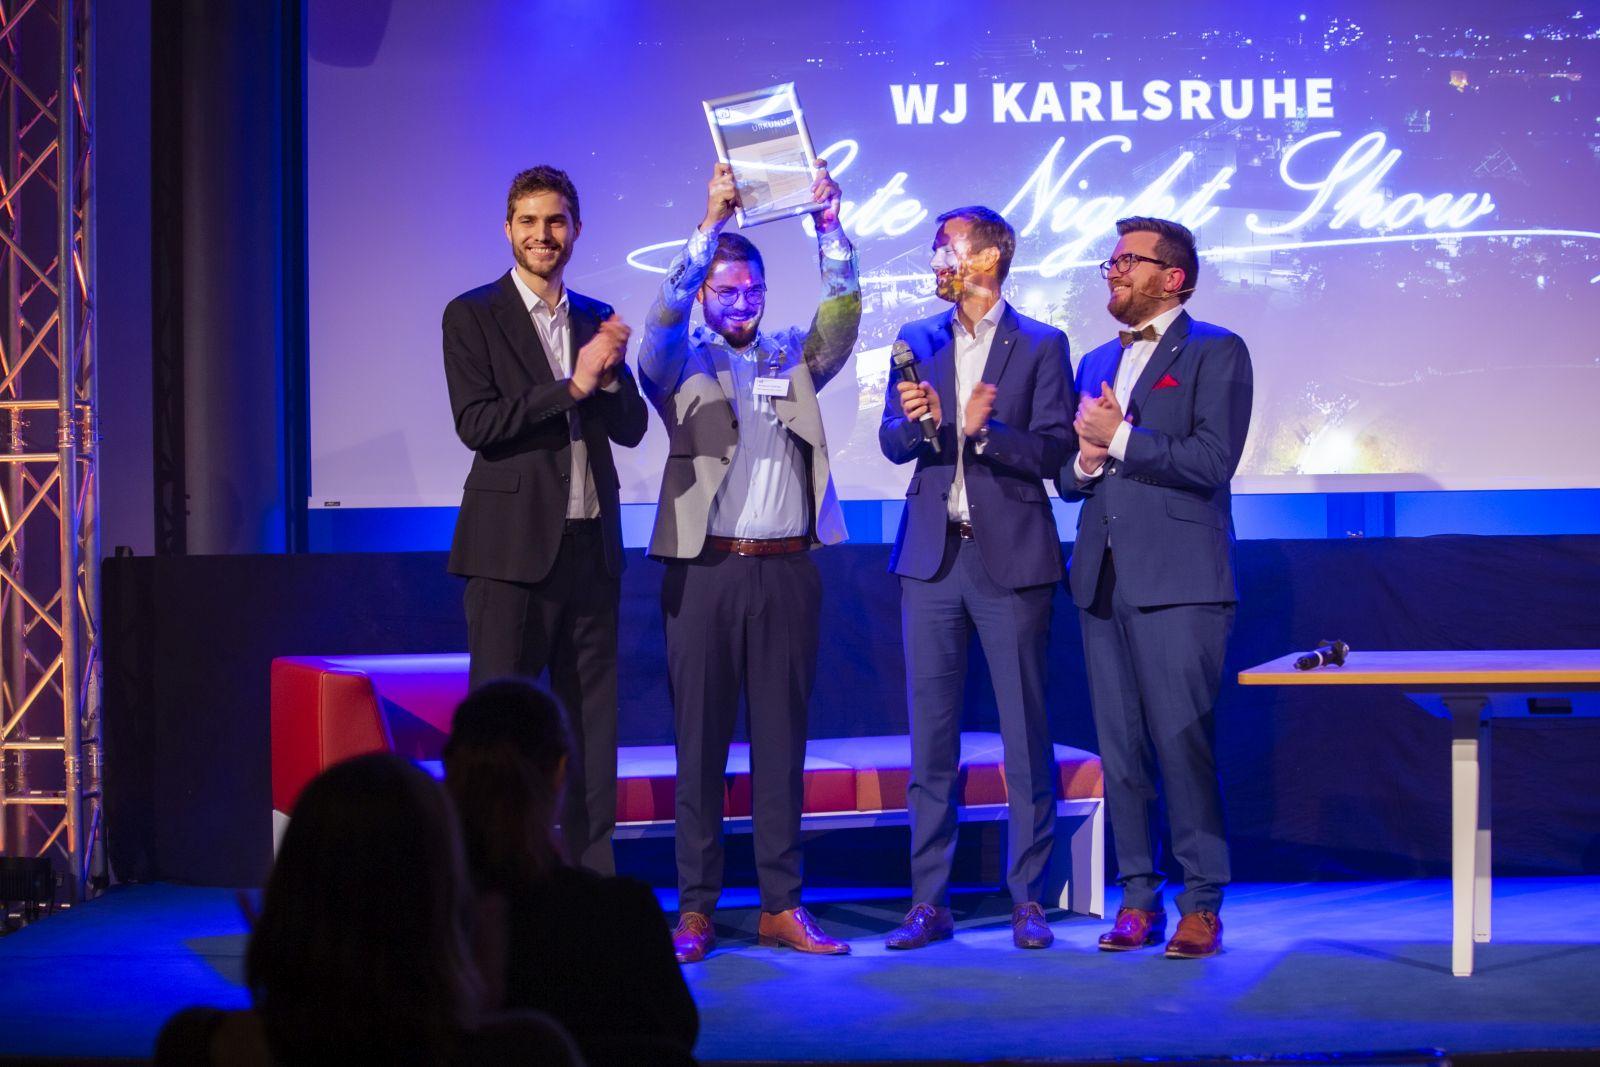 JHV 2019 Jahreshauptversammlung in der IHK mit Daniel Stöck Benjamin Völlinger Paul Schmidt Rising Star Award